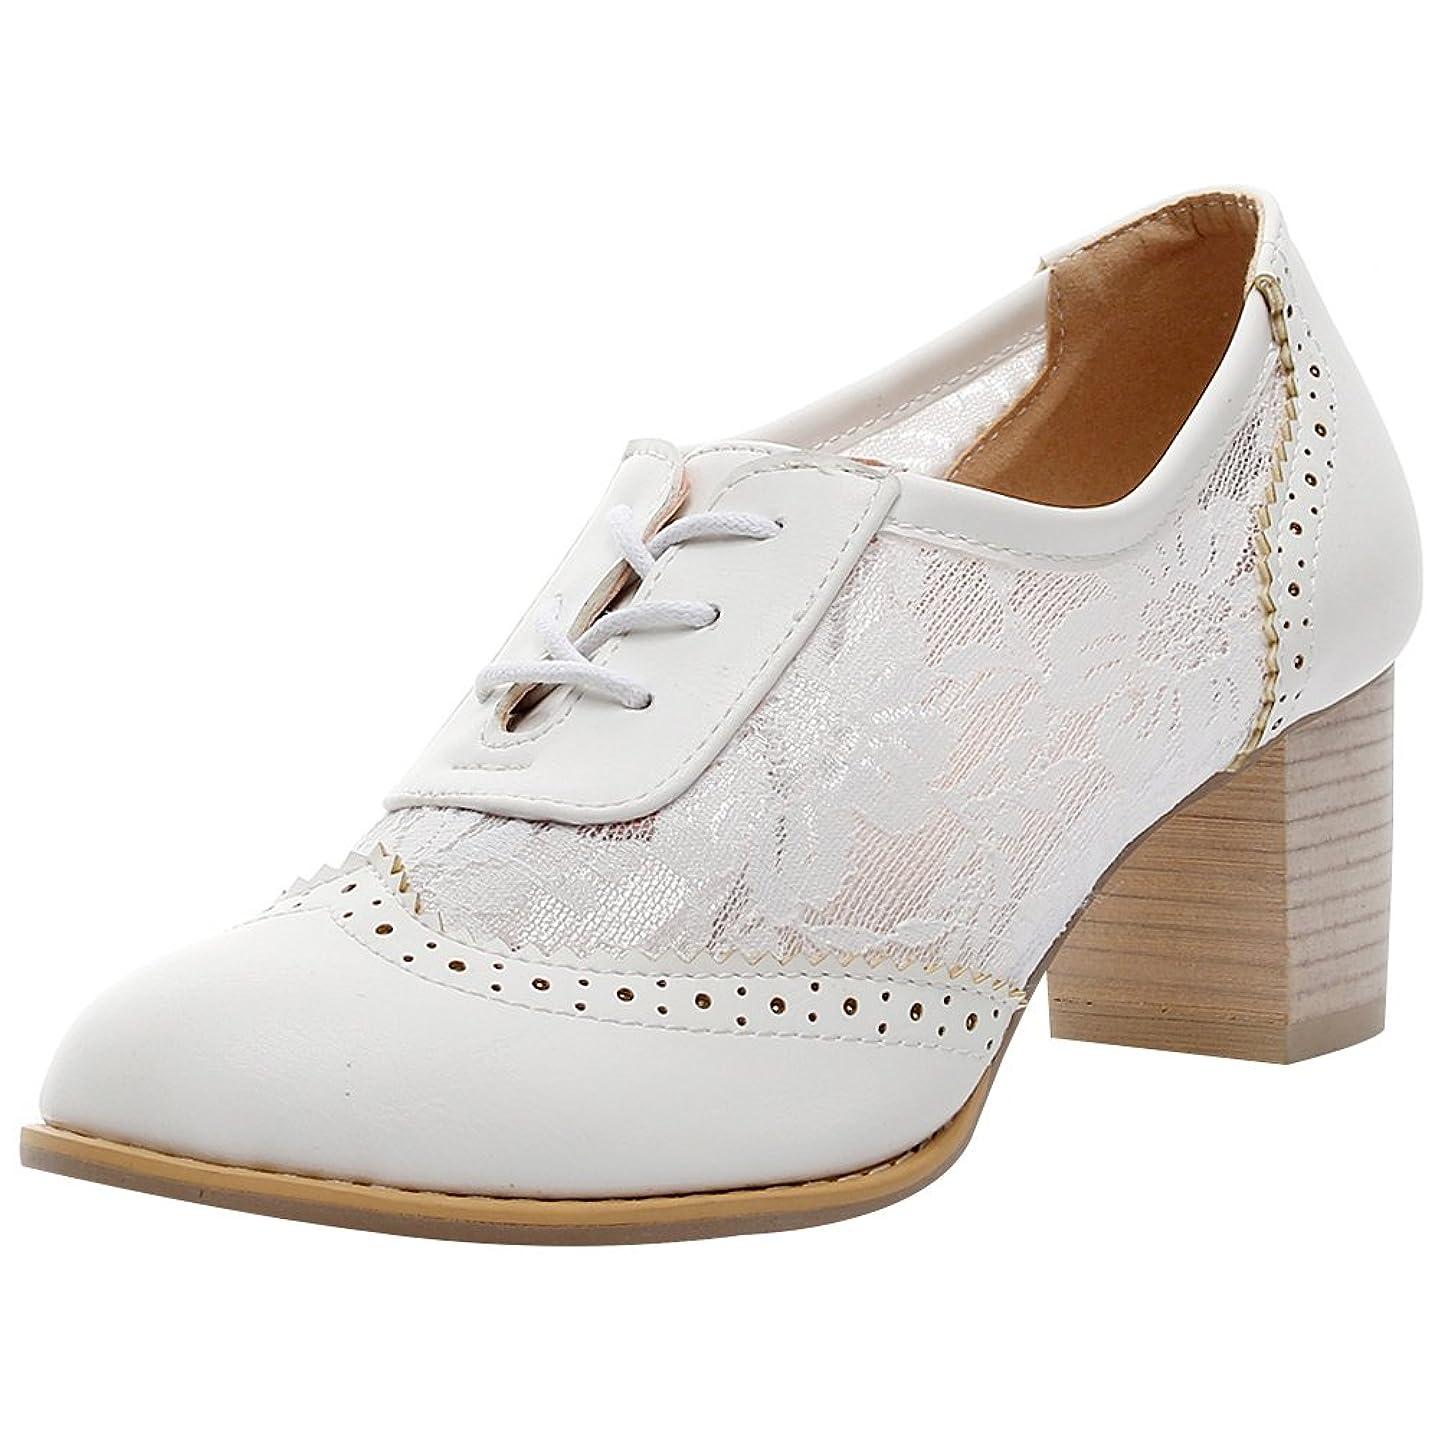 Jamron Women Summer Breathable PU&Lace Upper Oxfords Shoes Elegant Block Heel Brogue Dress Shoes